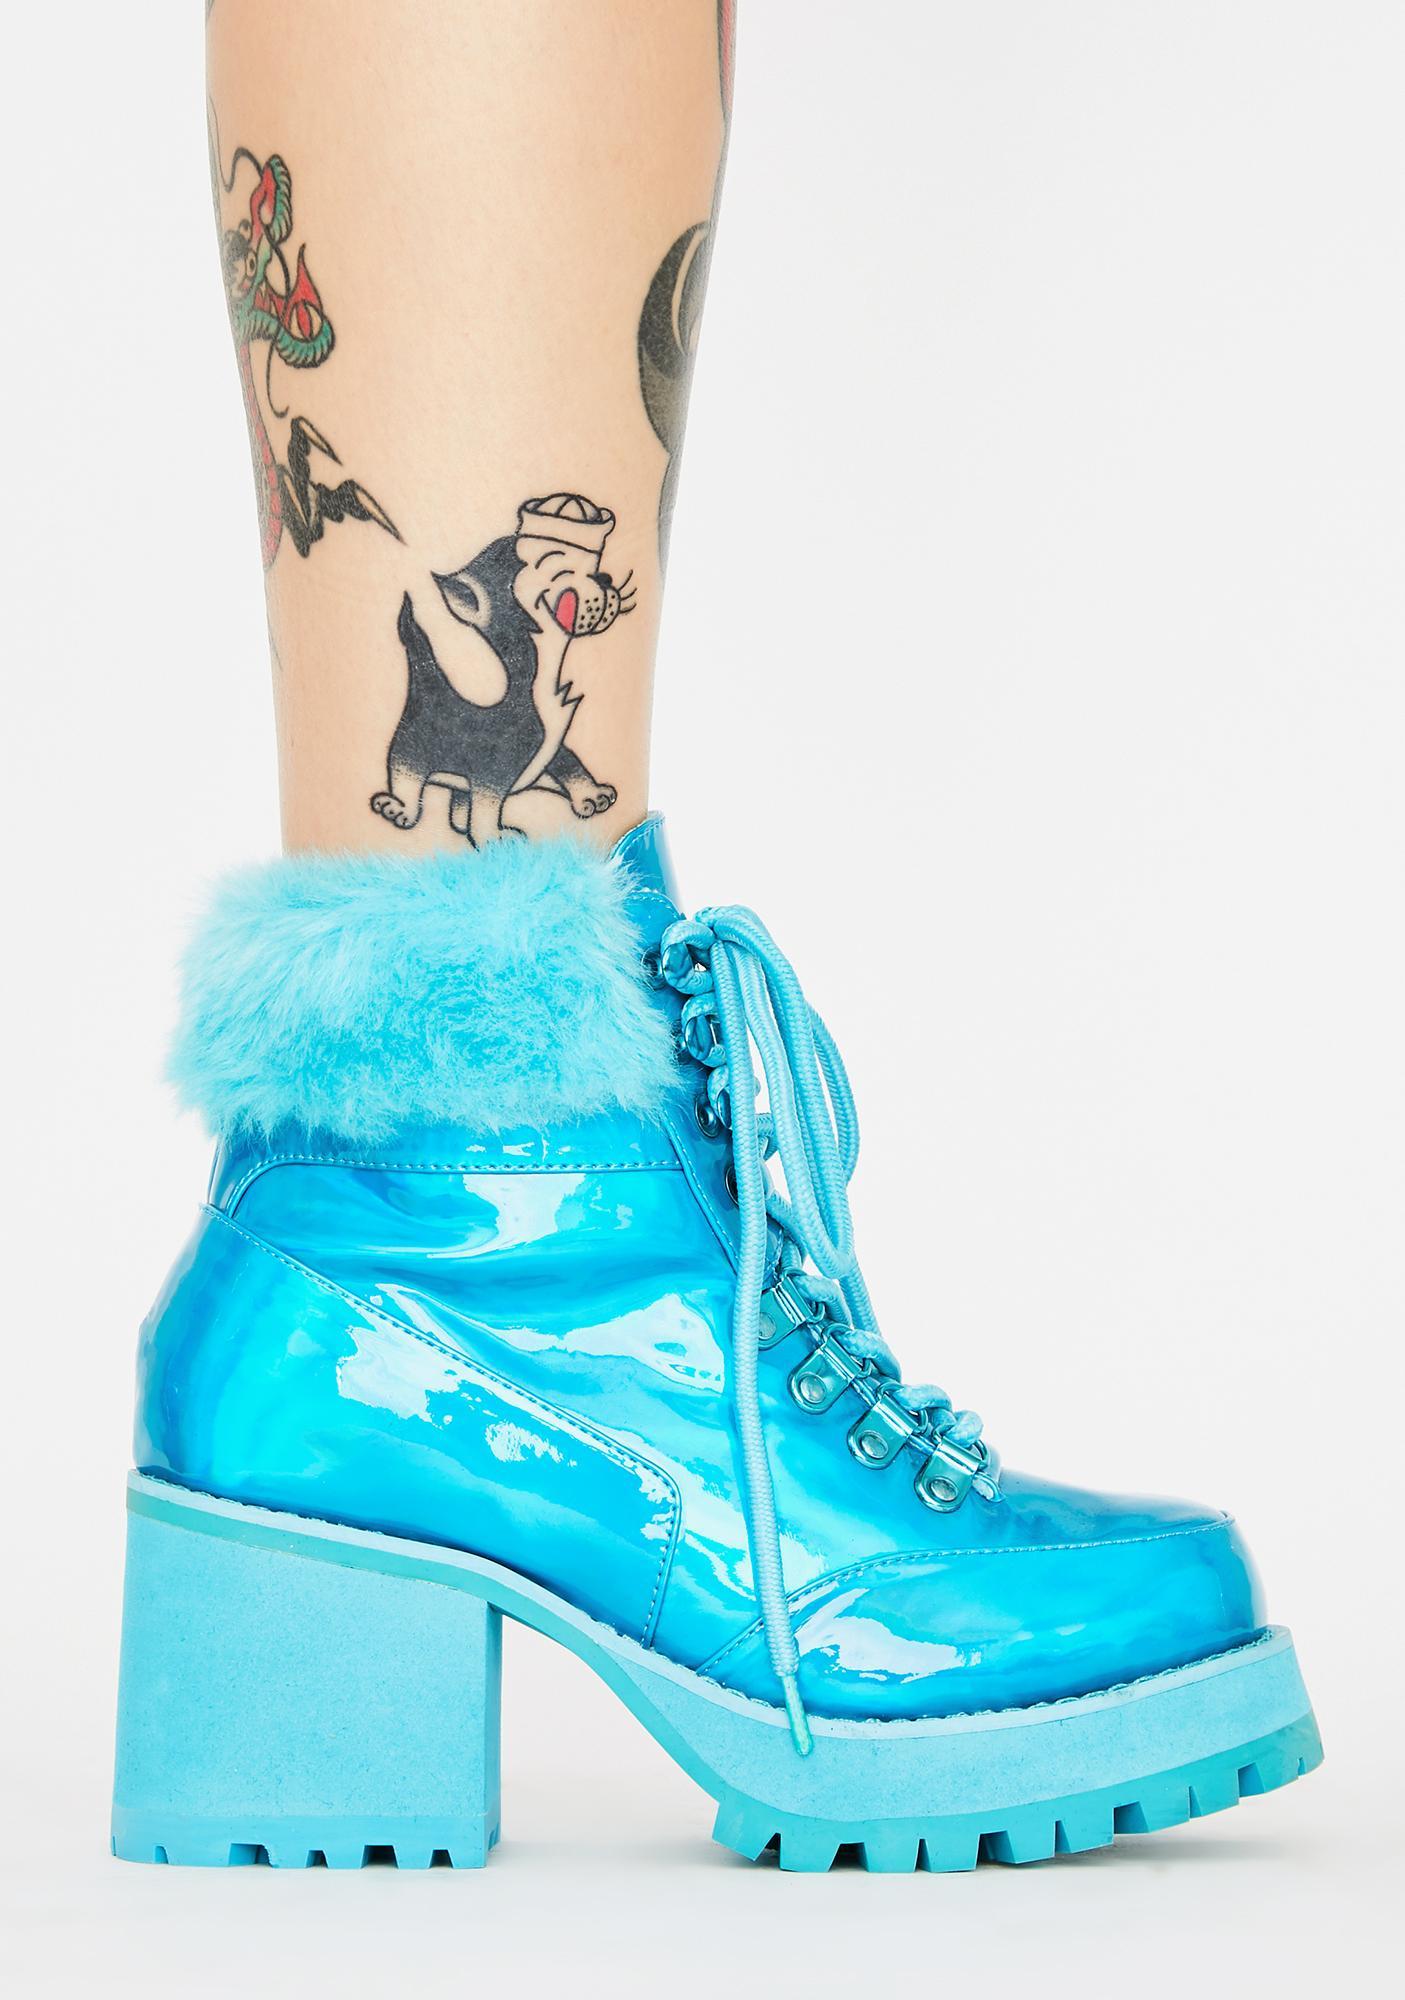 Club Exx Aqua Snow Blazin' Hiker Boots